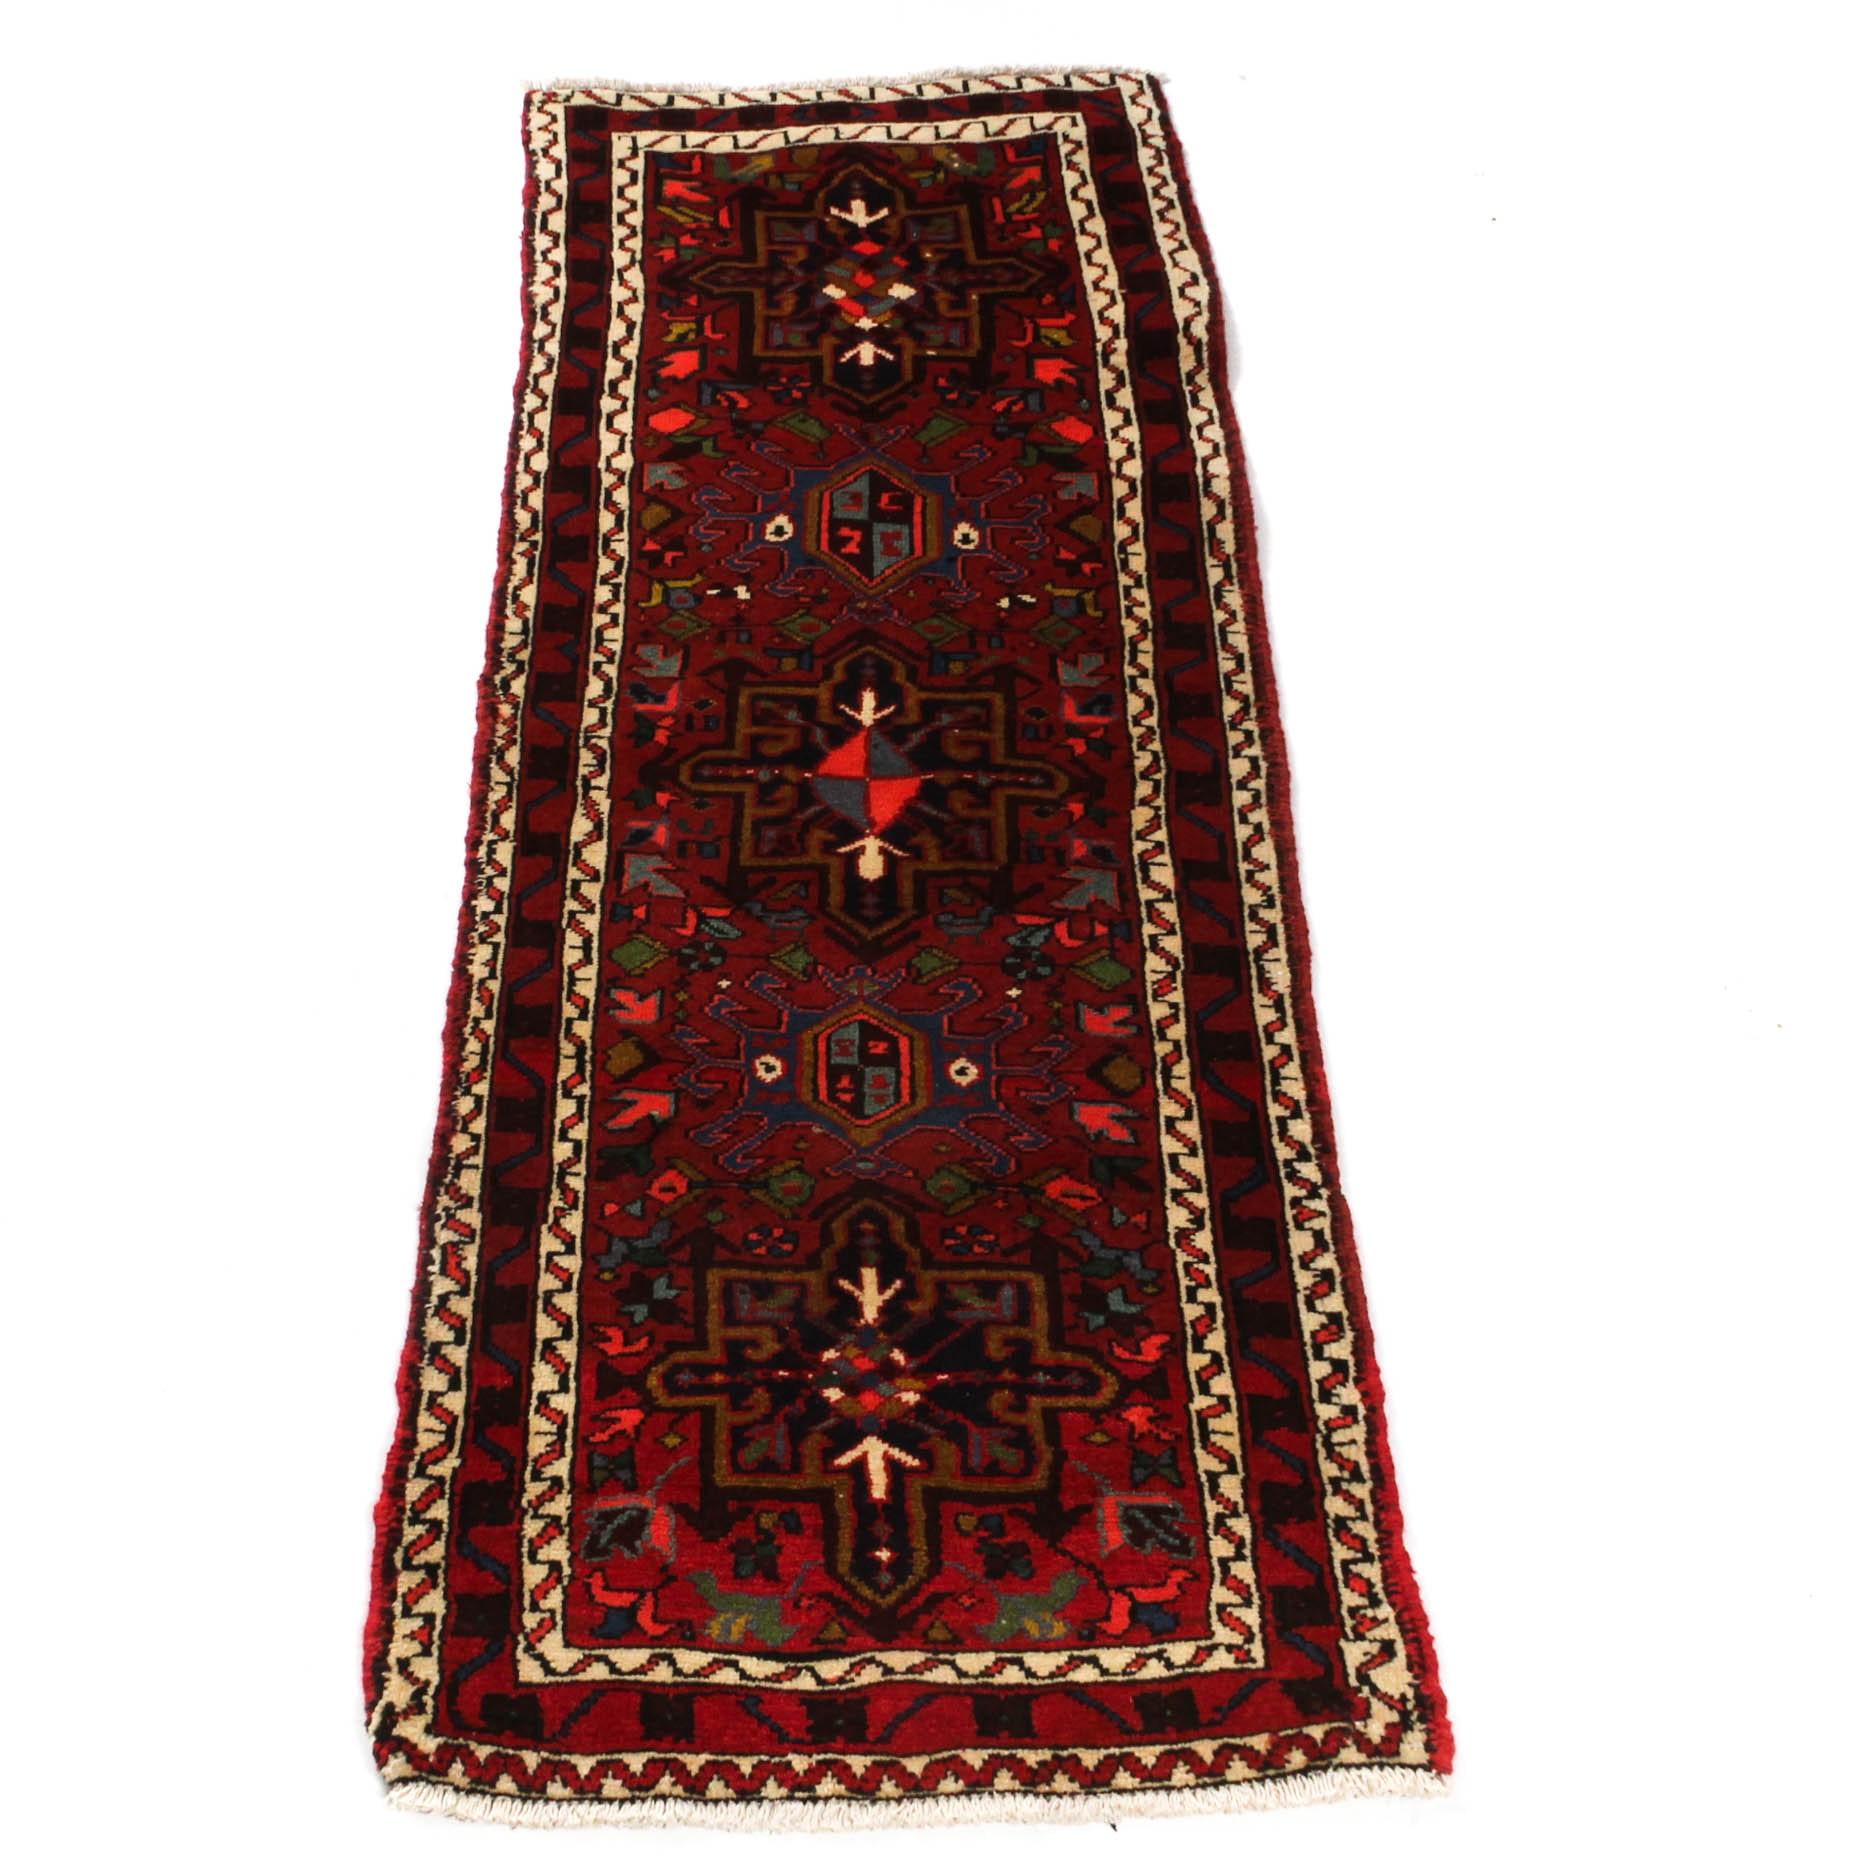 Hand-Knotted Persian Heriz Carpet Runner